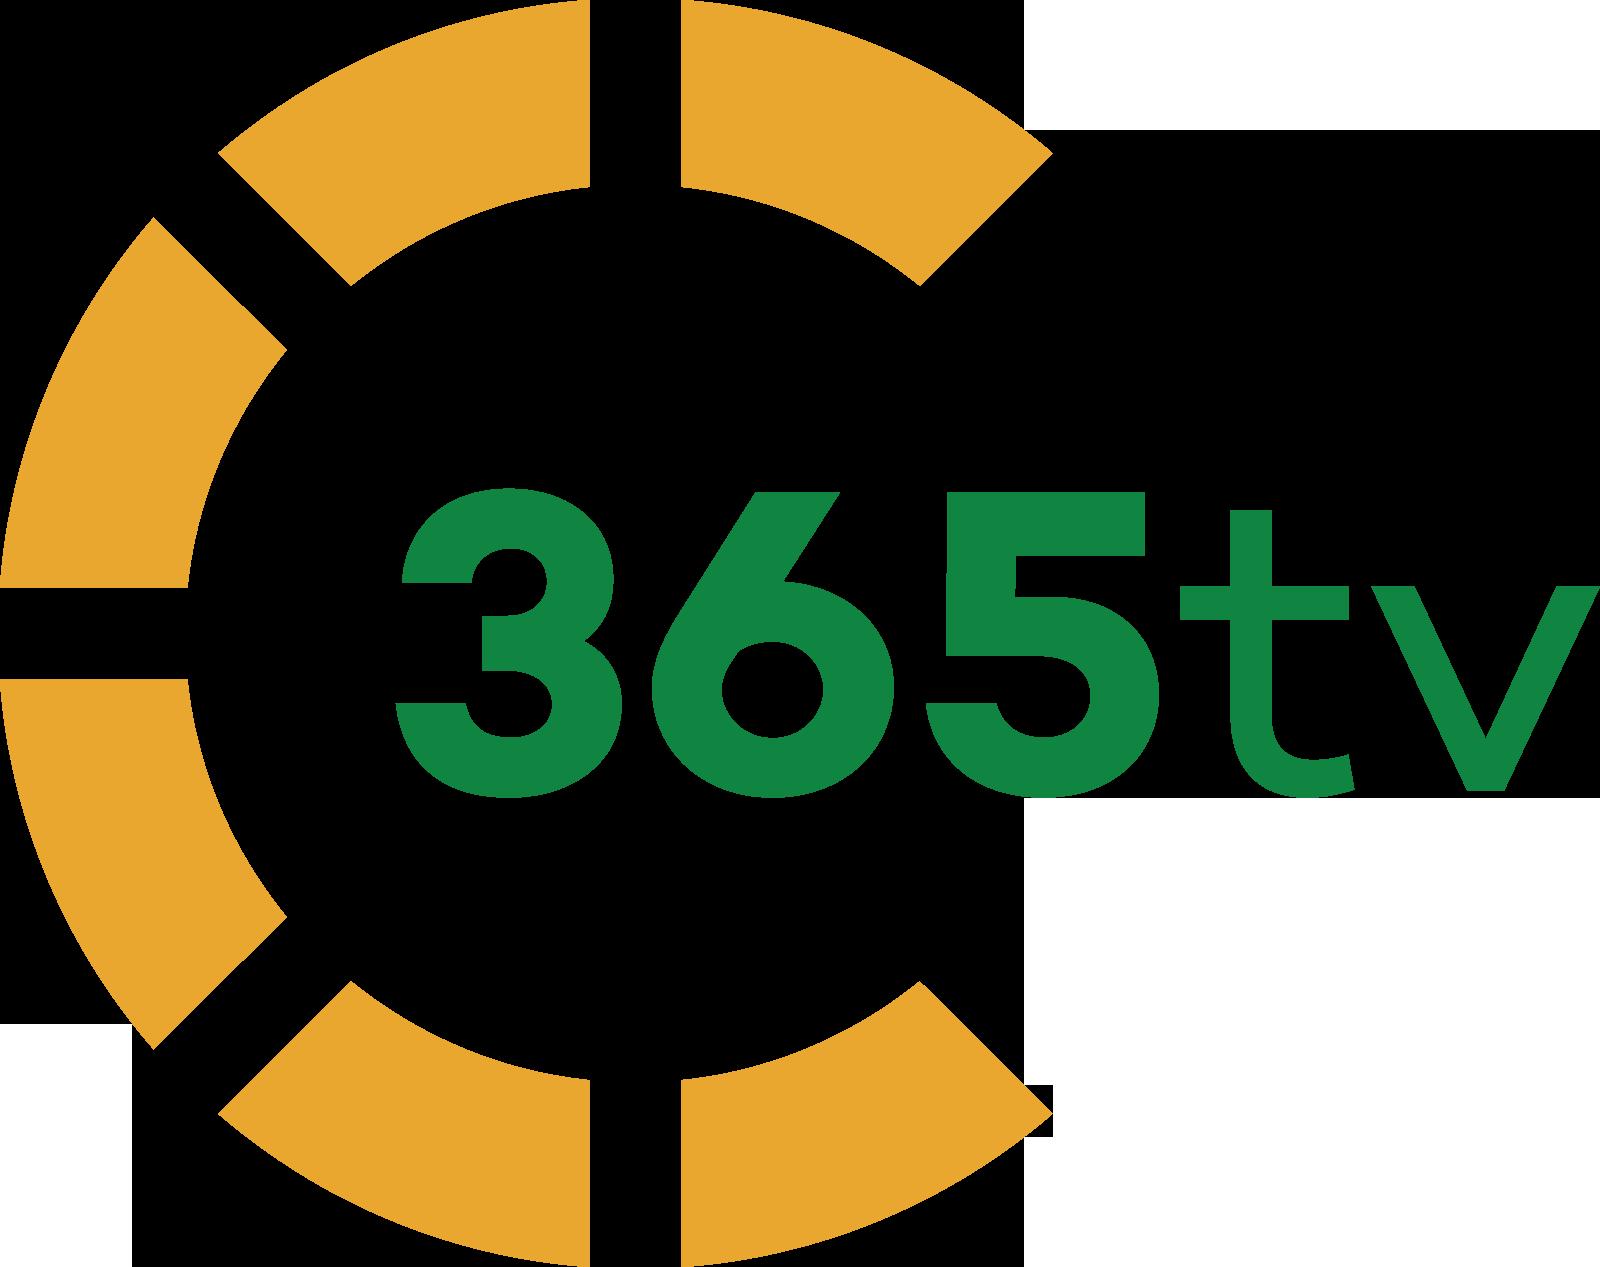 365tv-color-91eb9d07d4321c3e86df5631145056439f9b38a5634e0401b59fc56d7f82371e.png